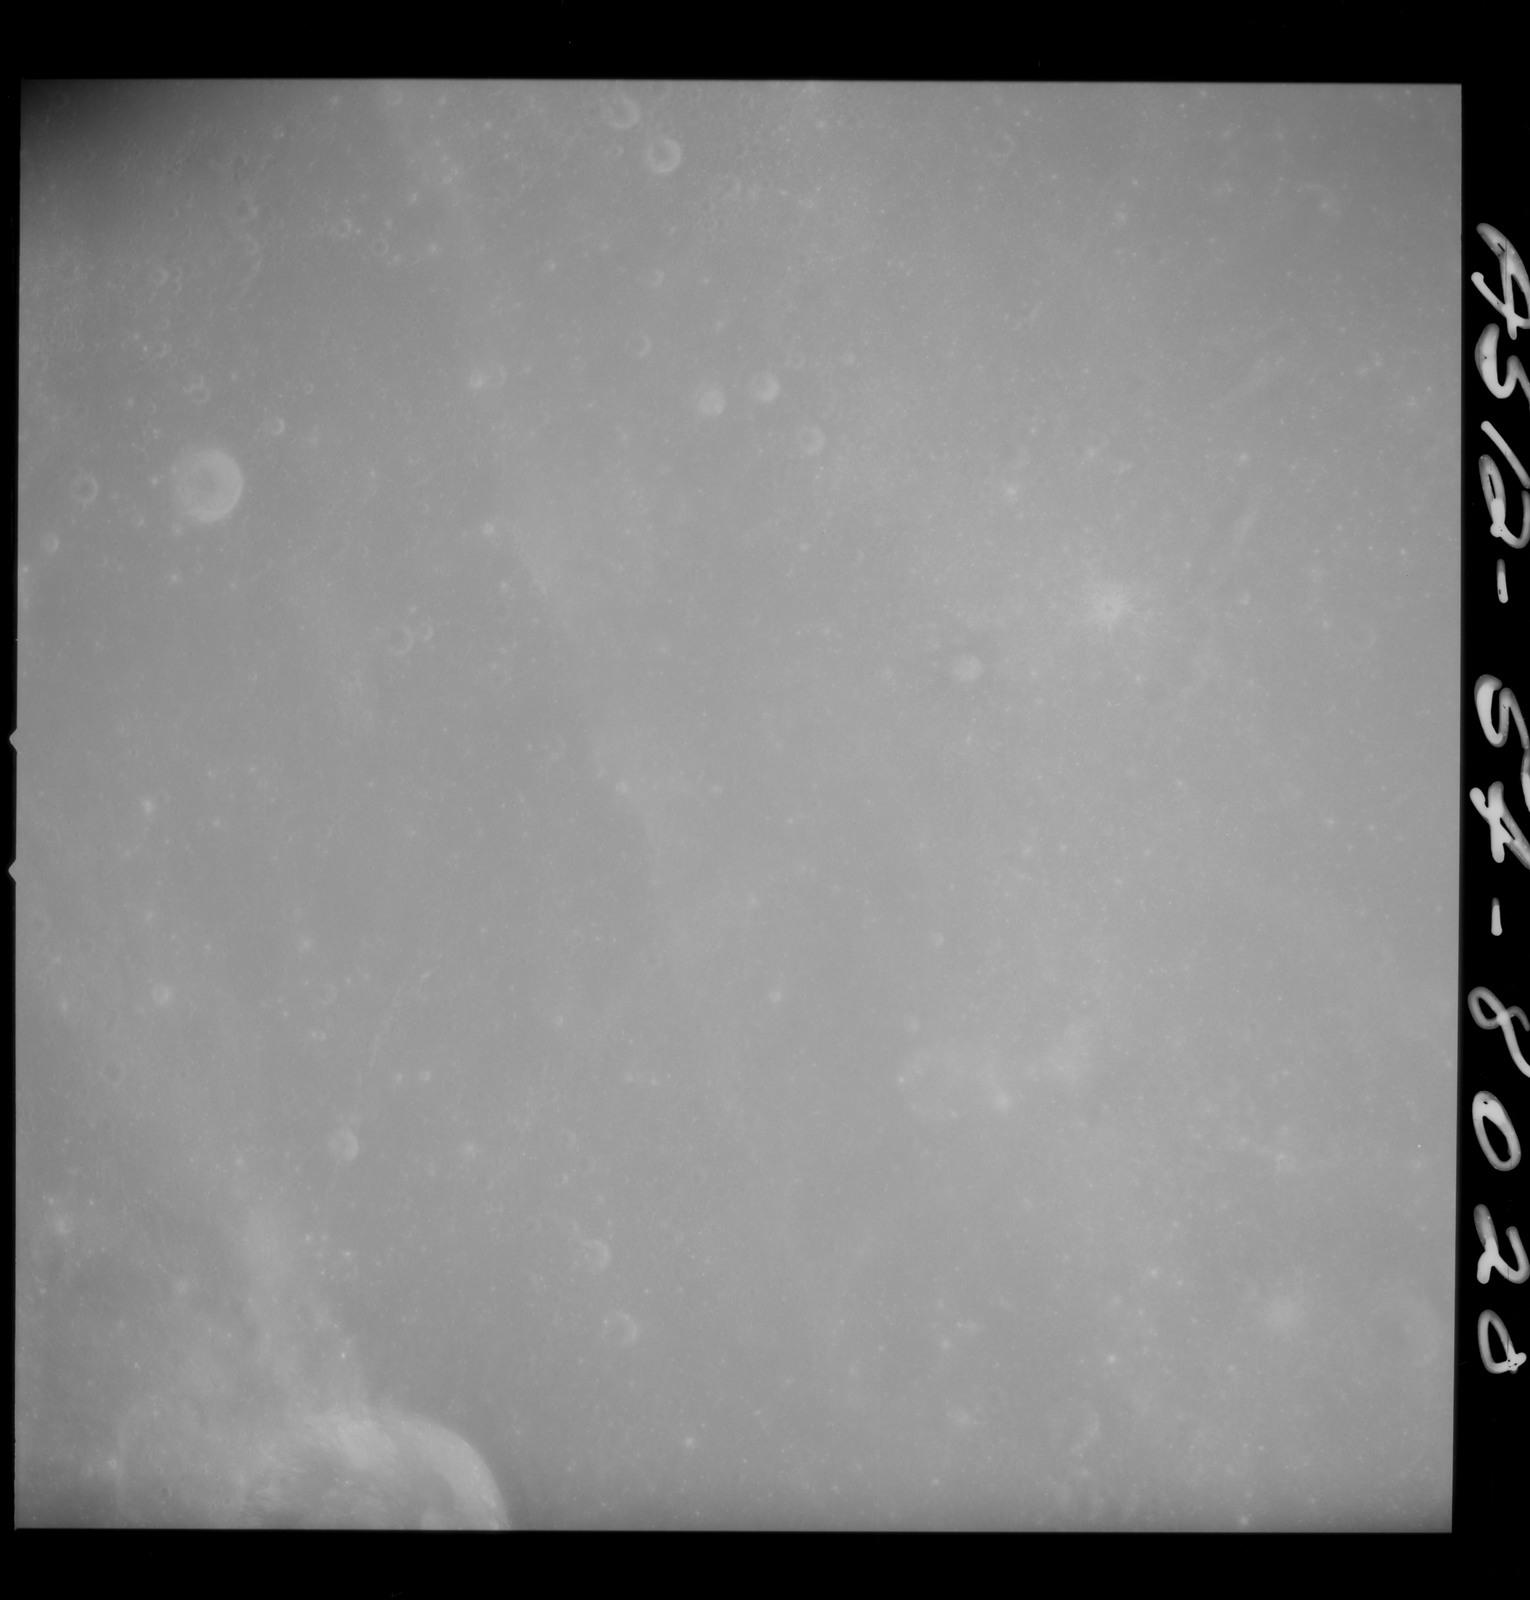 AS12-54-8020 - Apollo 12 - Apollo 12 Mission image  - Near vertical stereo strip view north of Crater Crozier